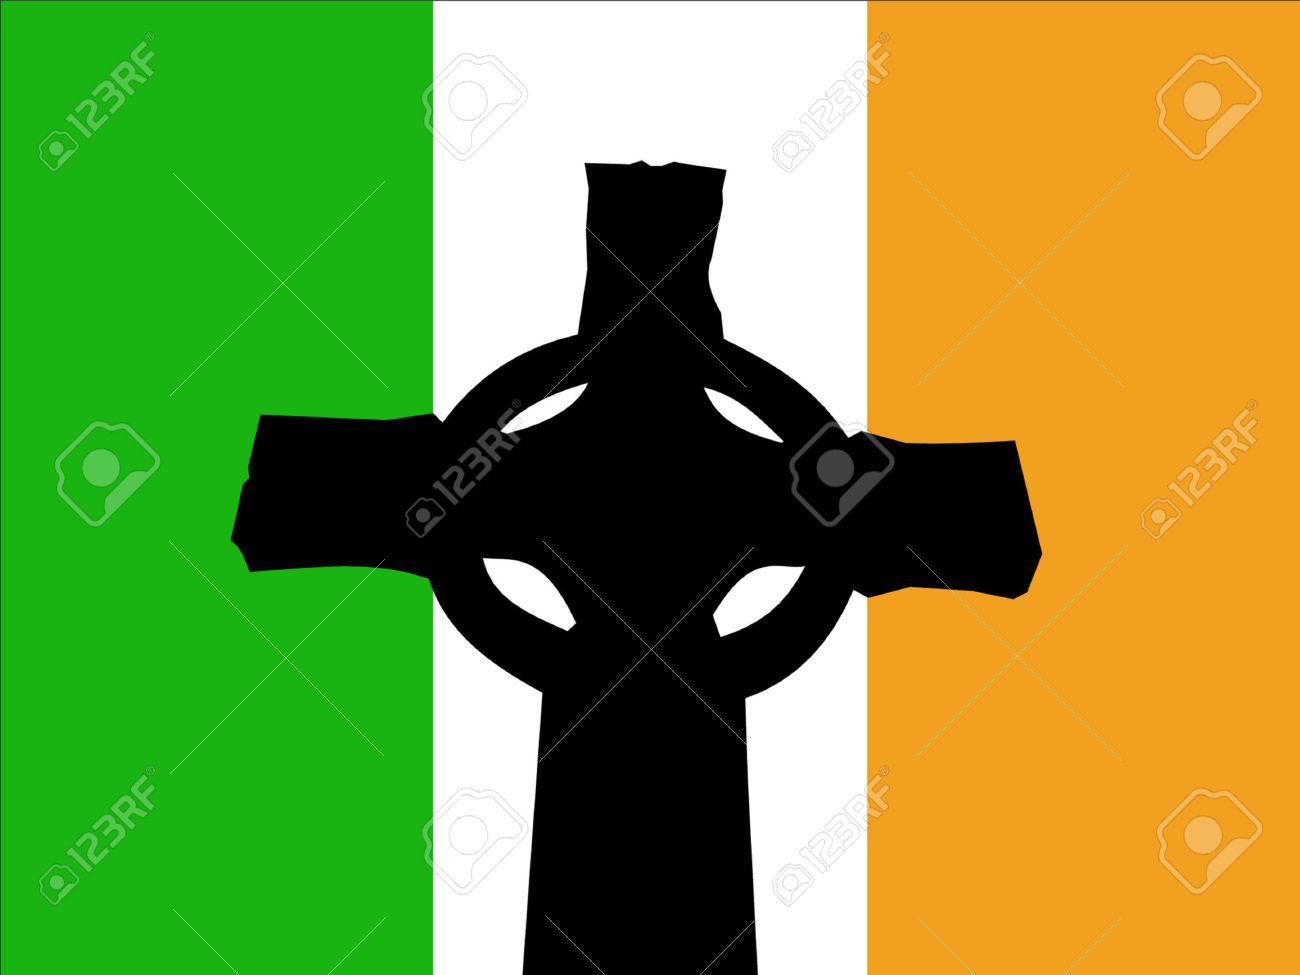 Images of Celtic Cross Flag | 1300x975